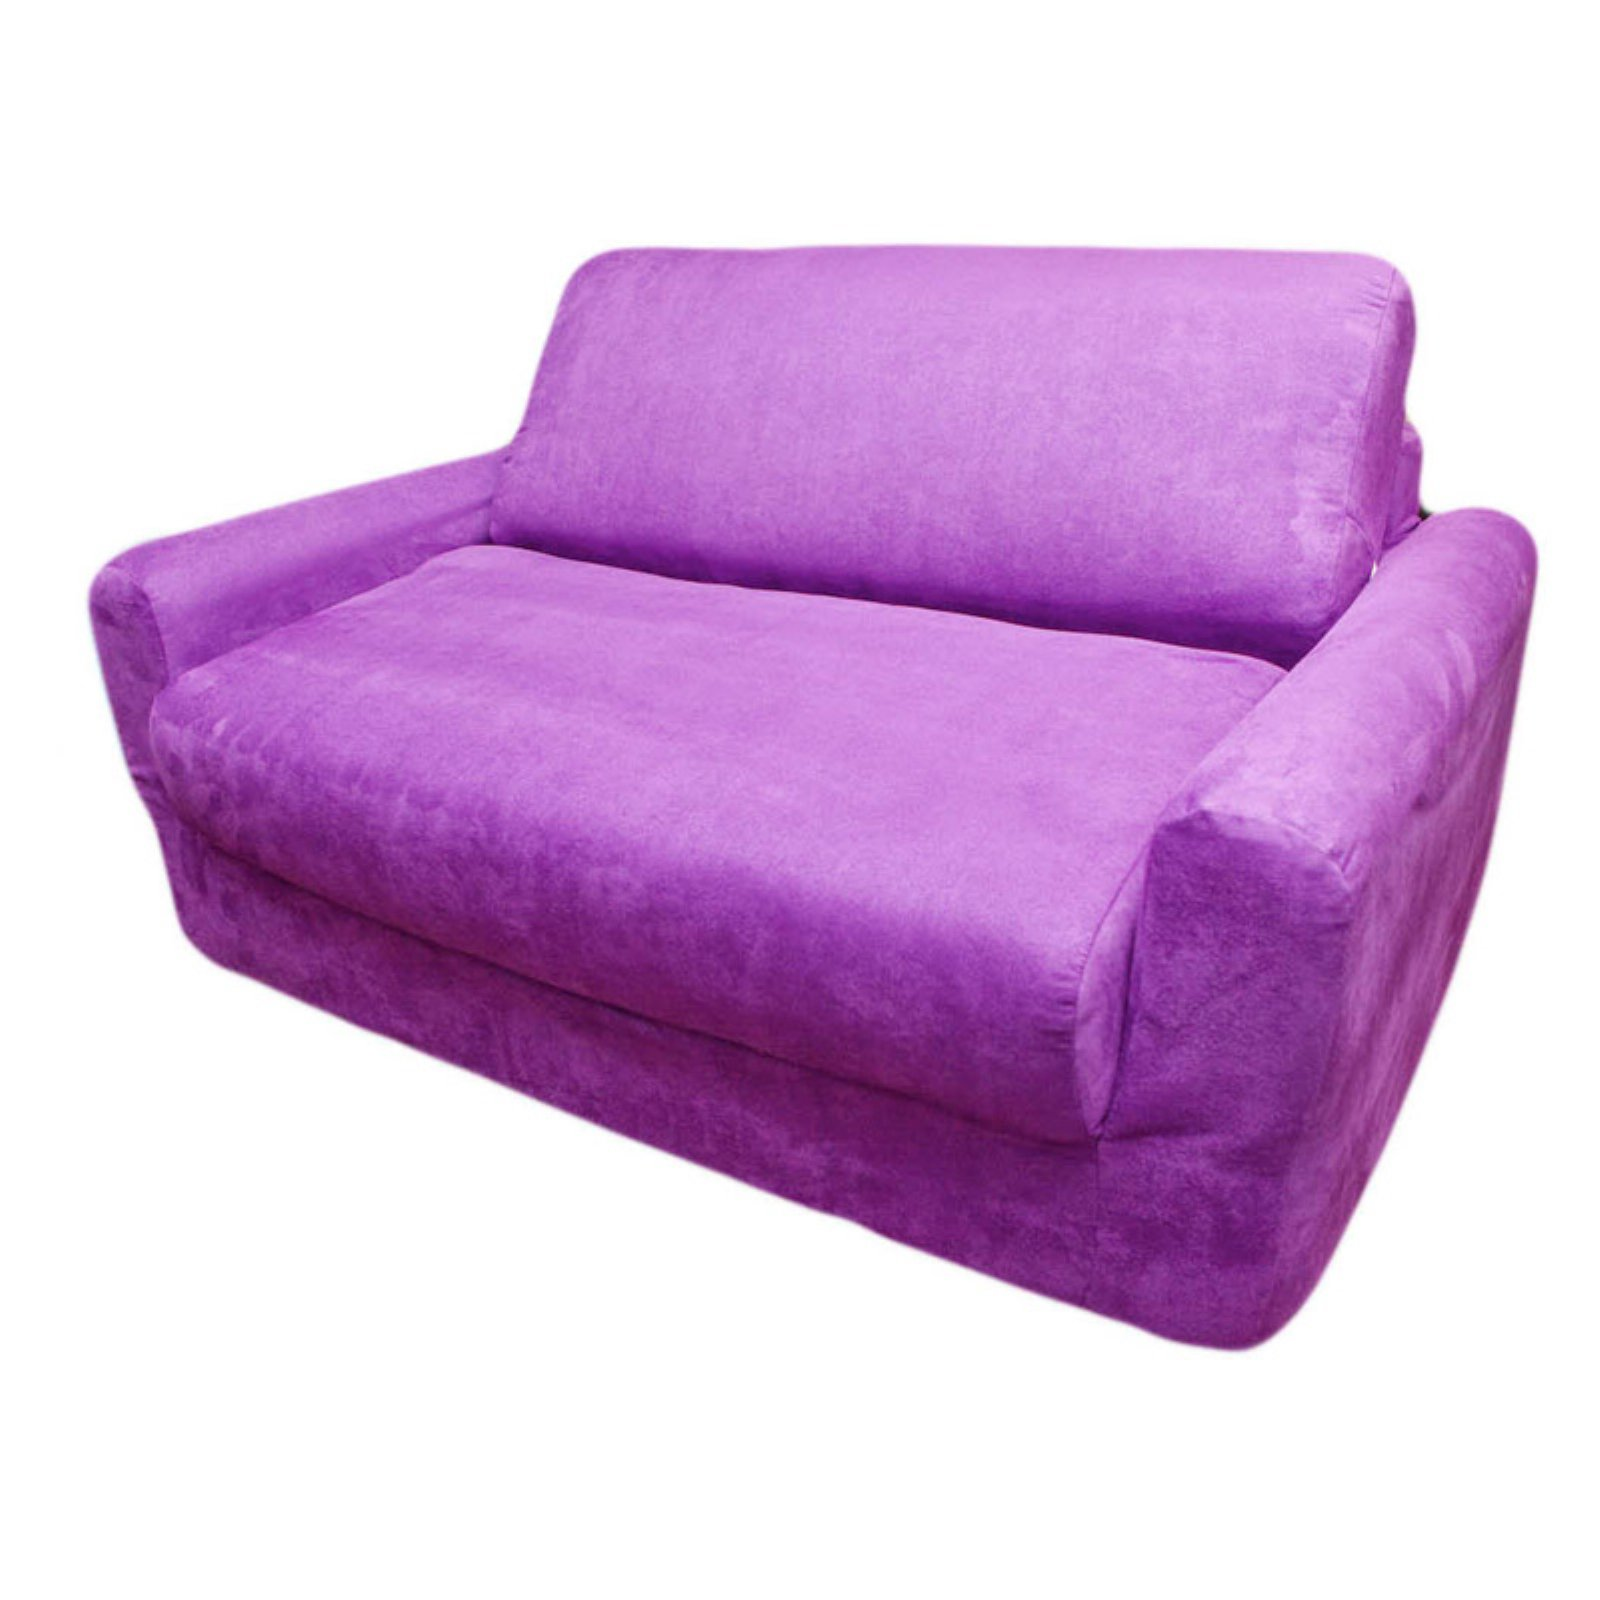 Fun Furnishings Purple Sofa Sleeper Purple Sofa Sleeper Sofa Upholstered Sofa